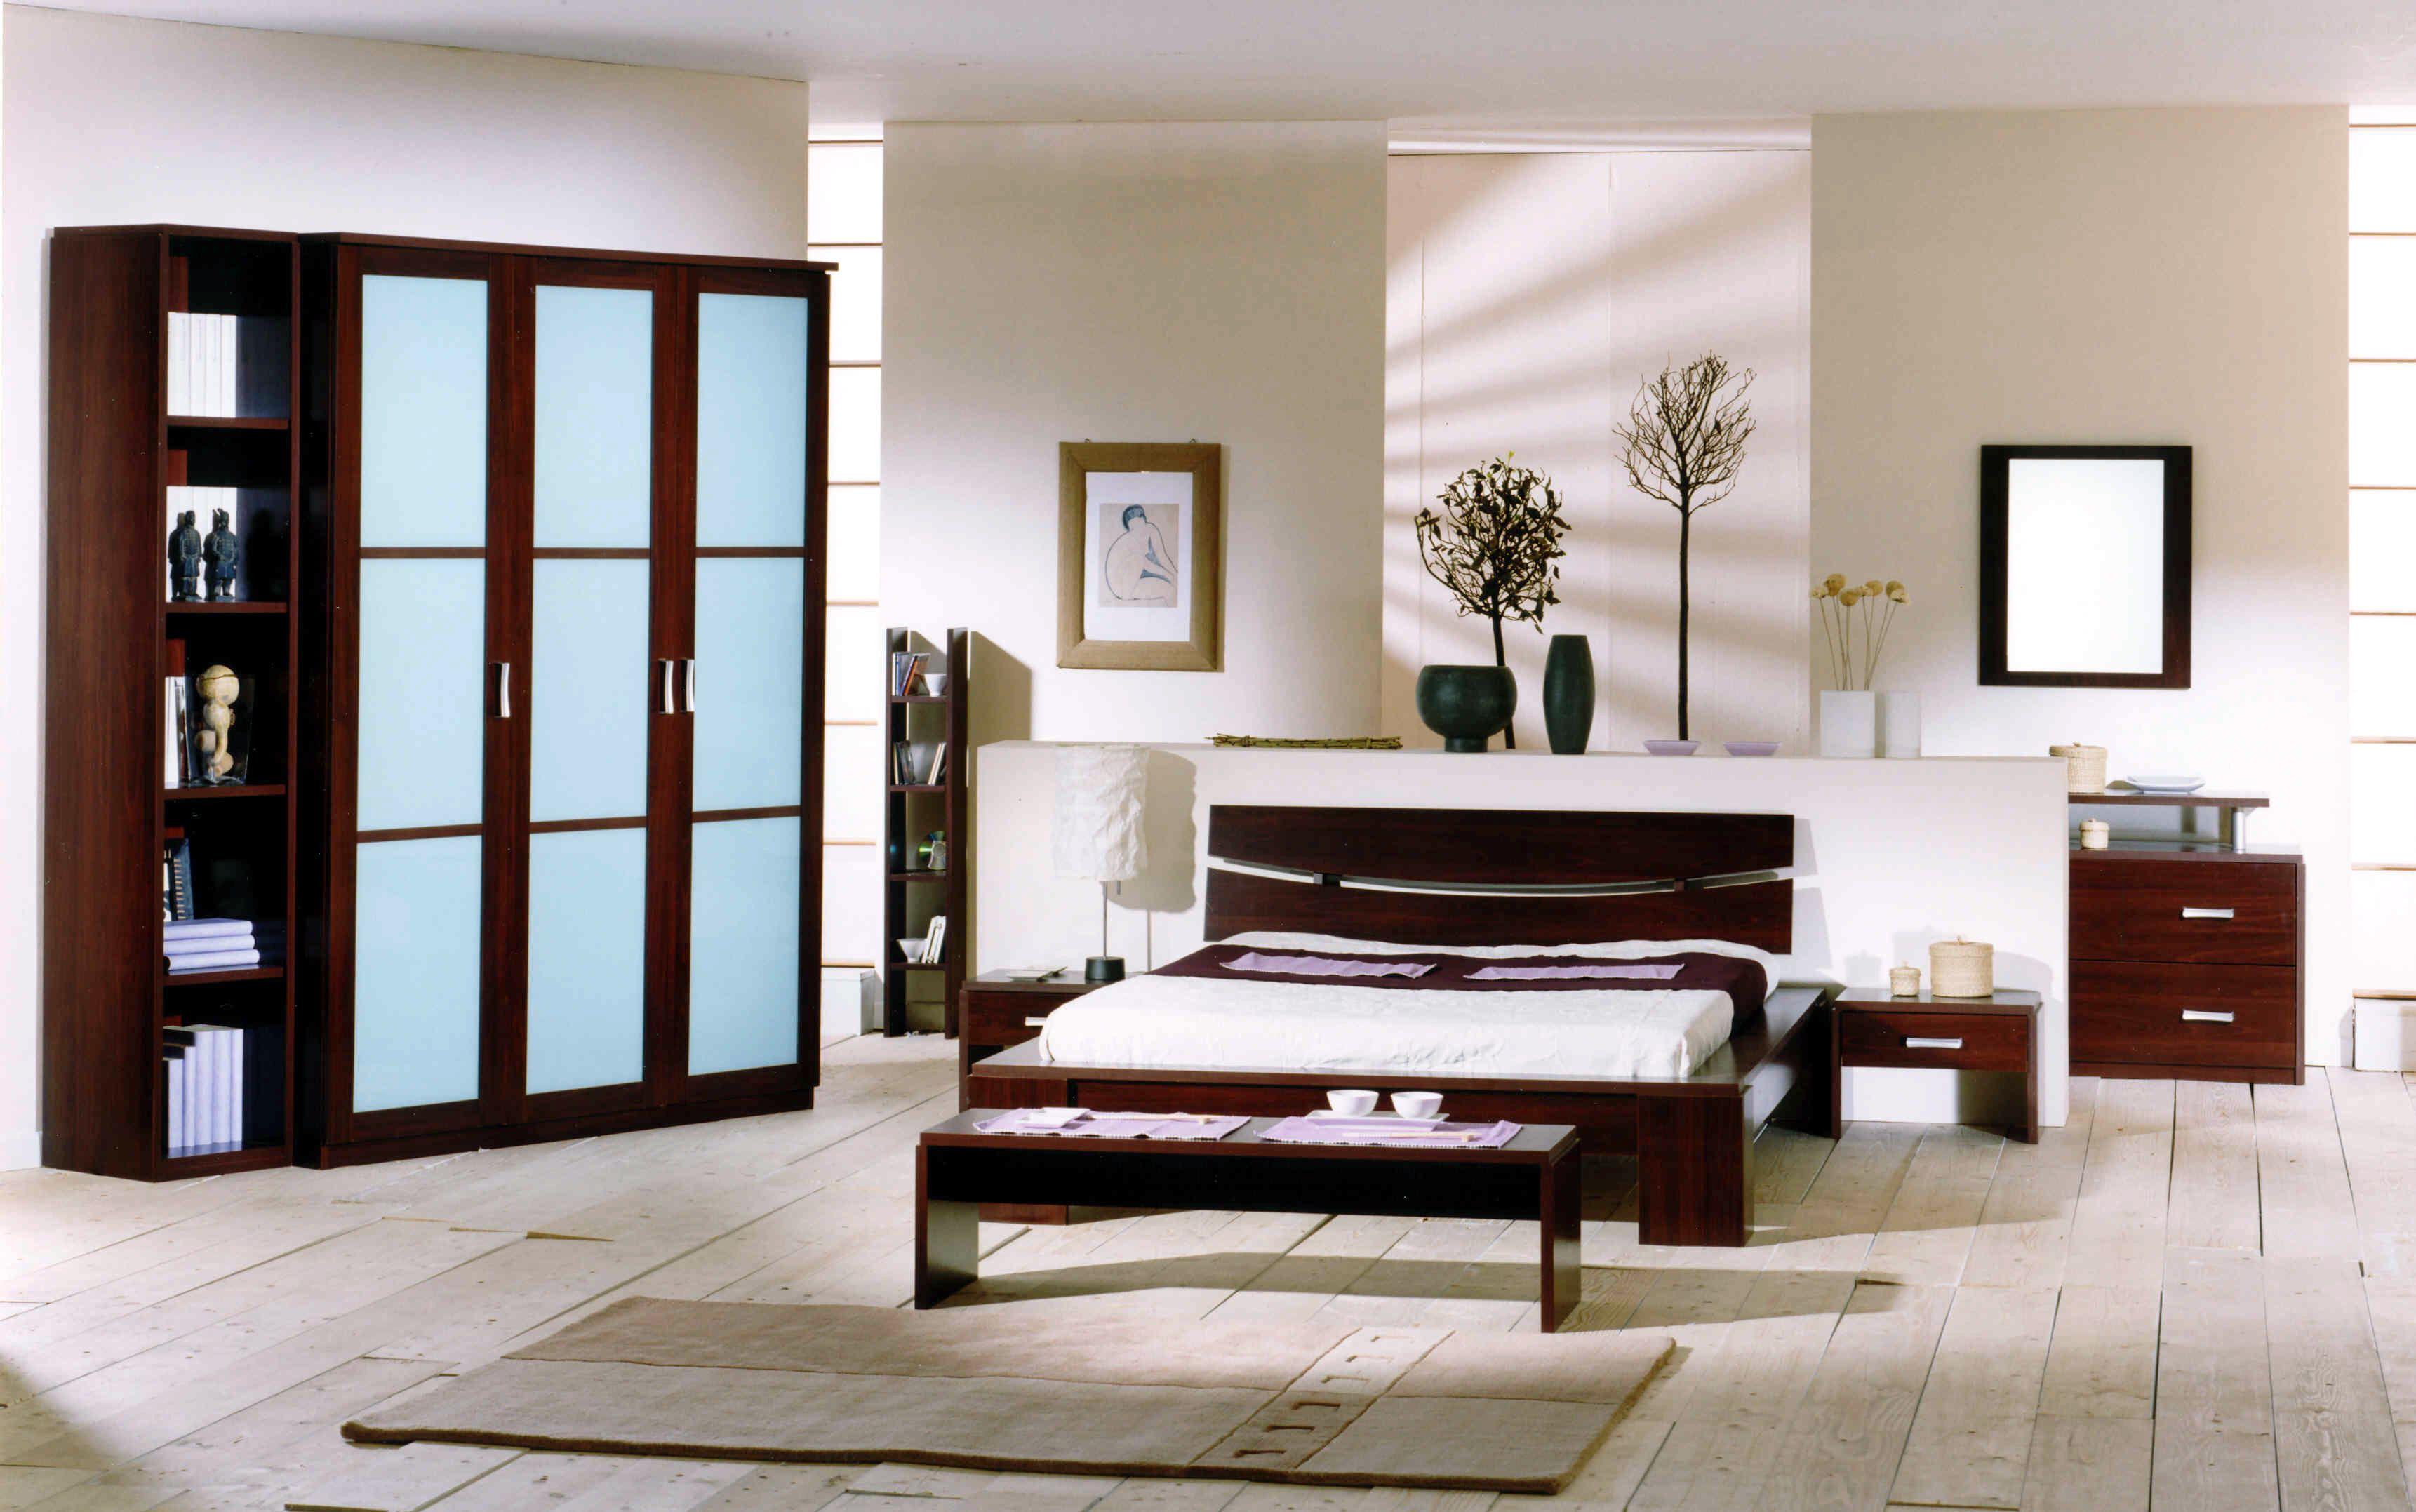 Wooden Headboard Zen  Google Search  Common Bed  Pinterest Stunning Latest Bedroom Cupboard Designs Design Ideas